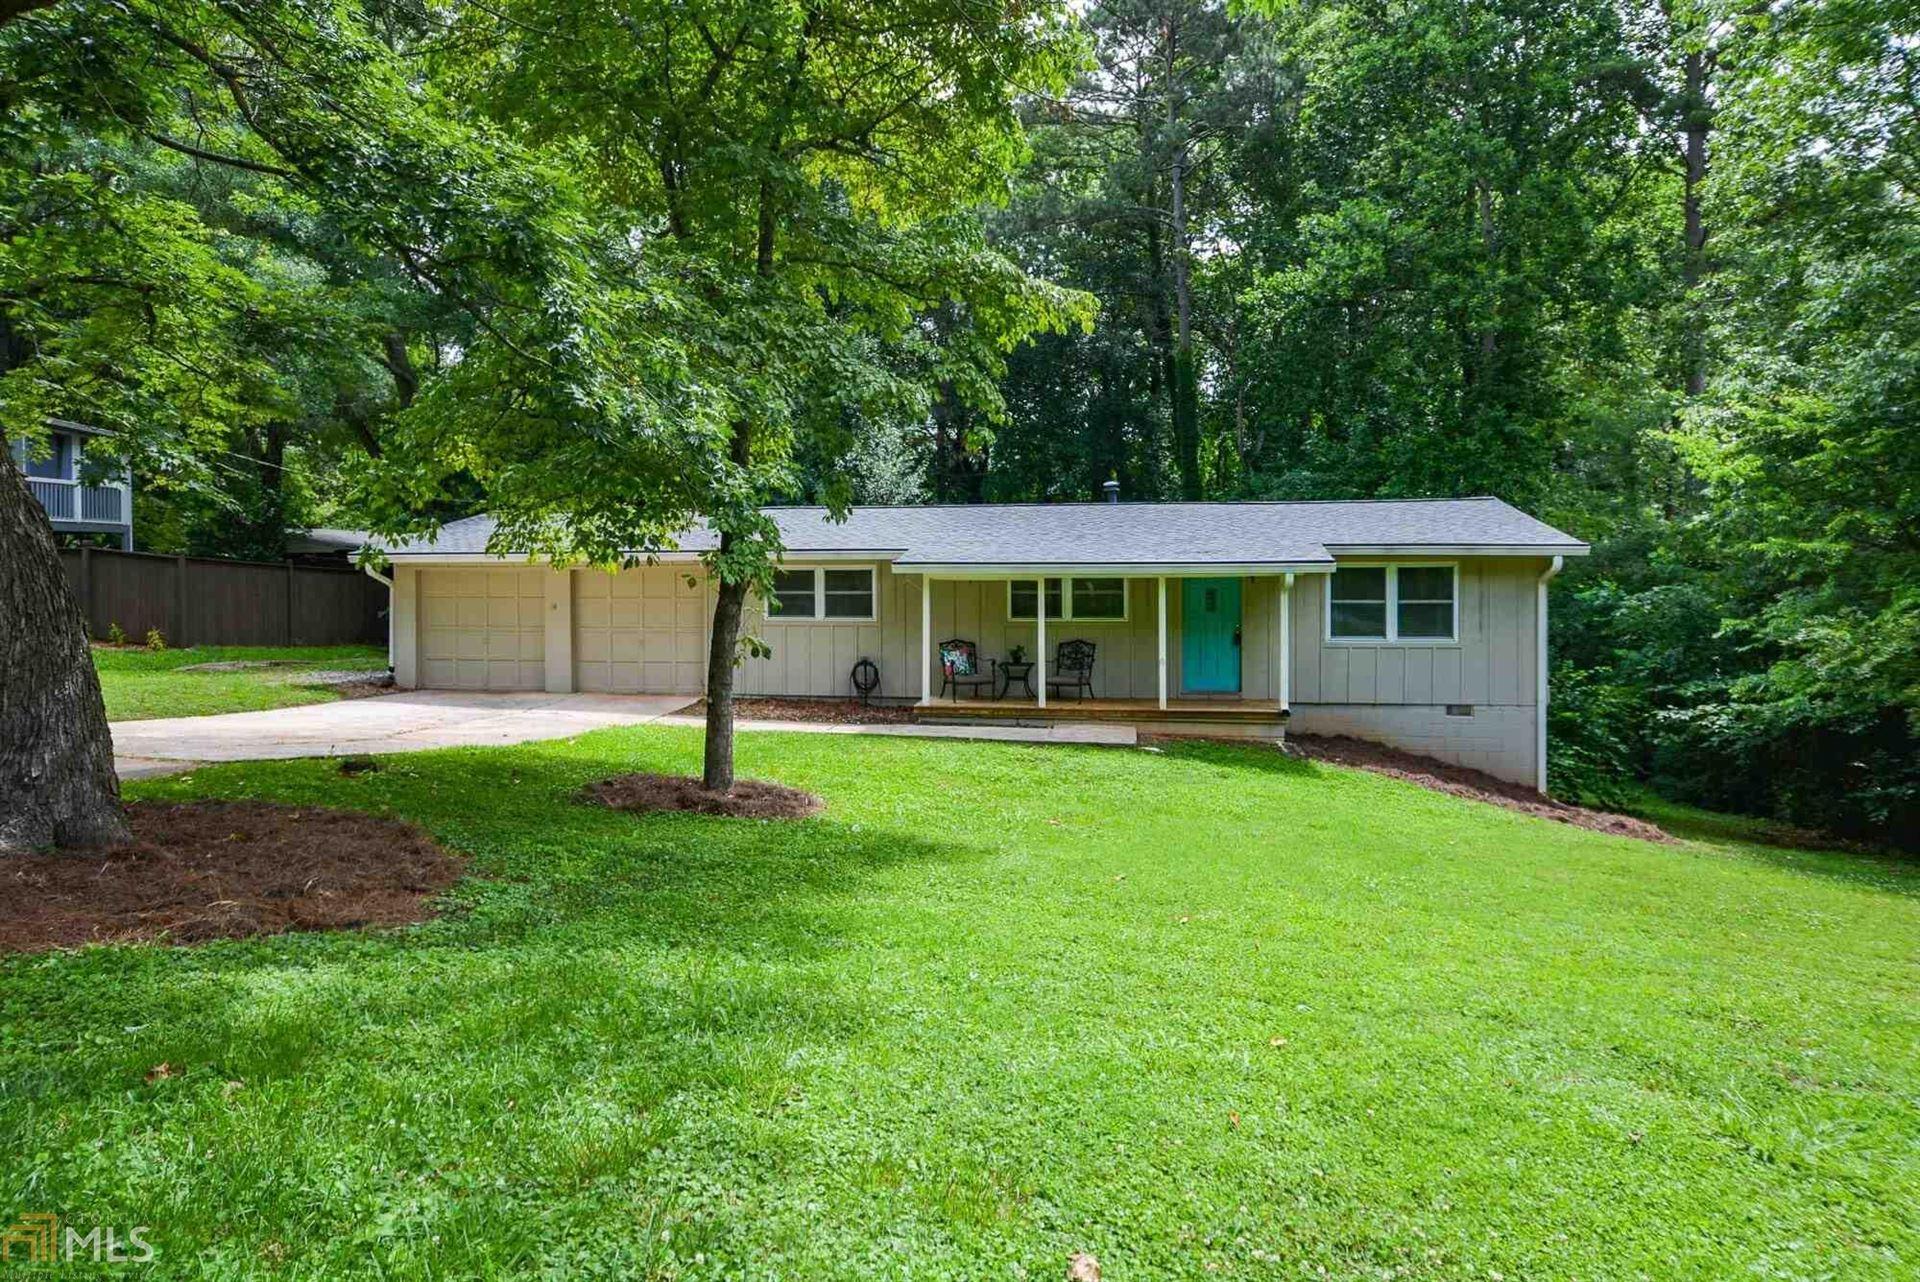 128 Robinhood Dr, Woodstock, GA 30188 - #: 8805726